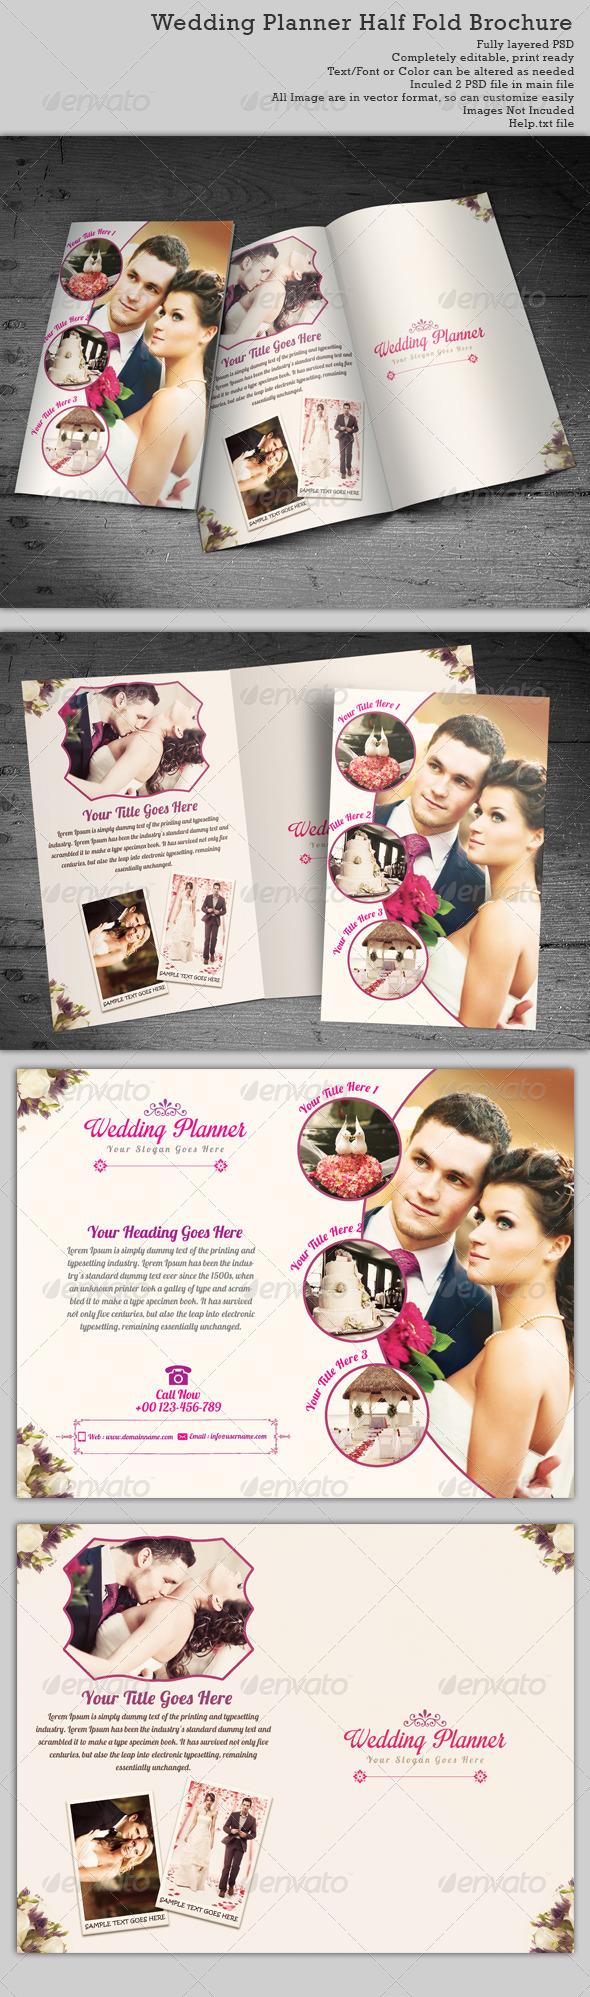 Wedding Planner Half-Fold Brochure Templates - Brochures Print Templates